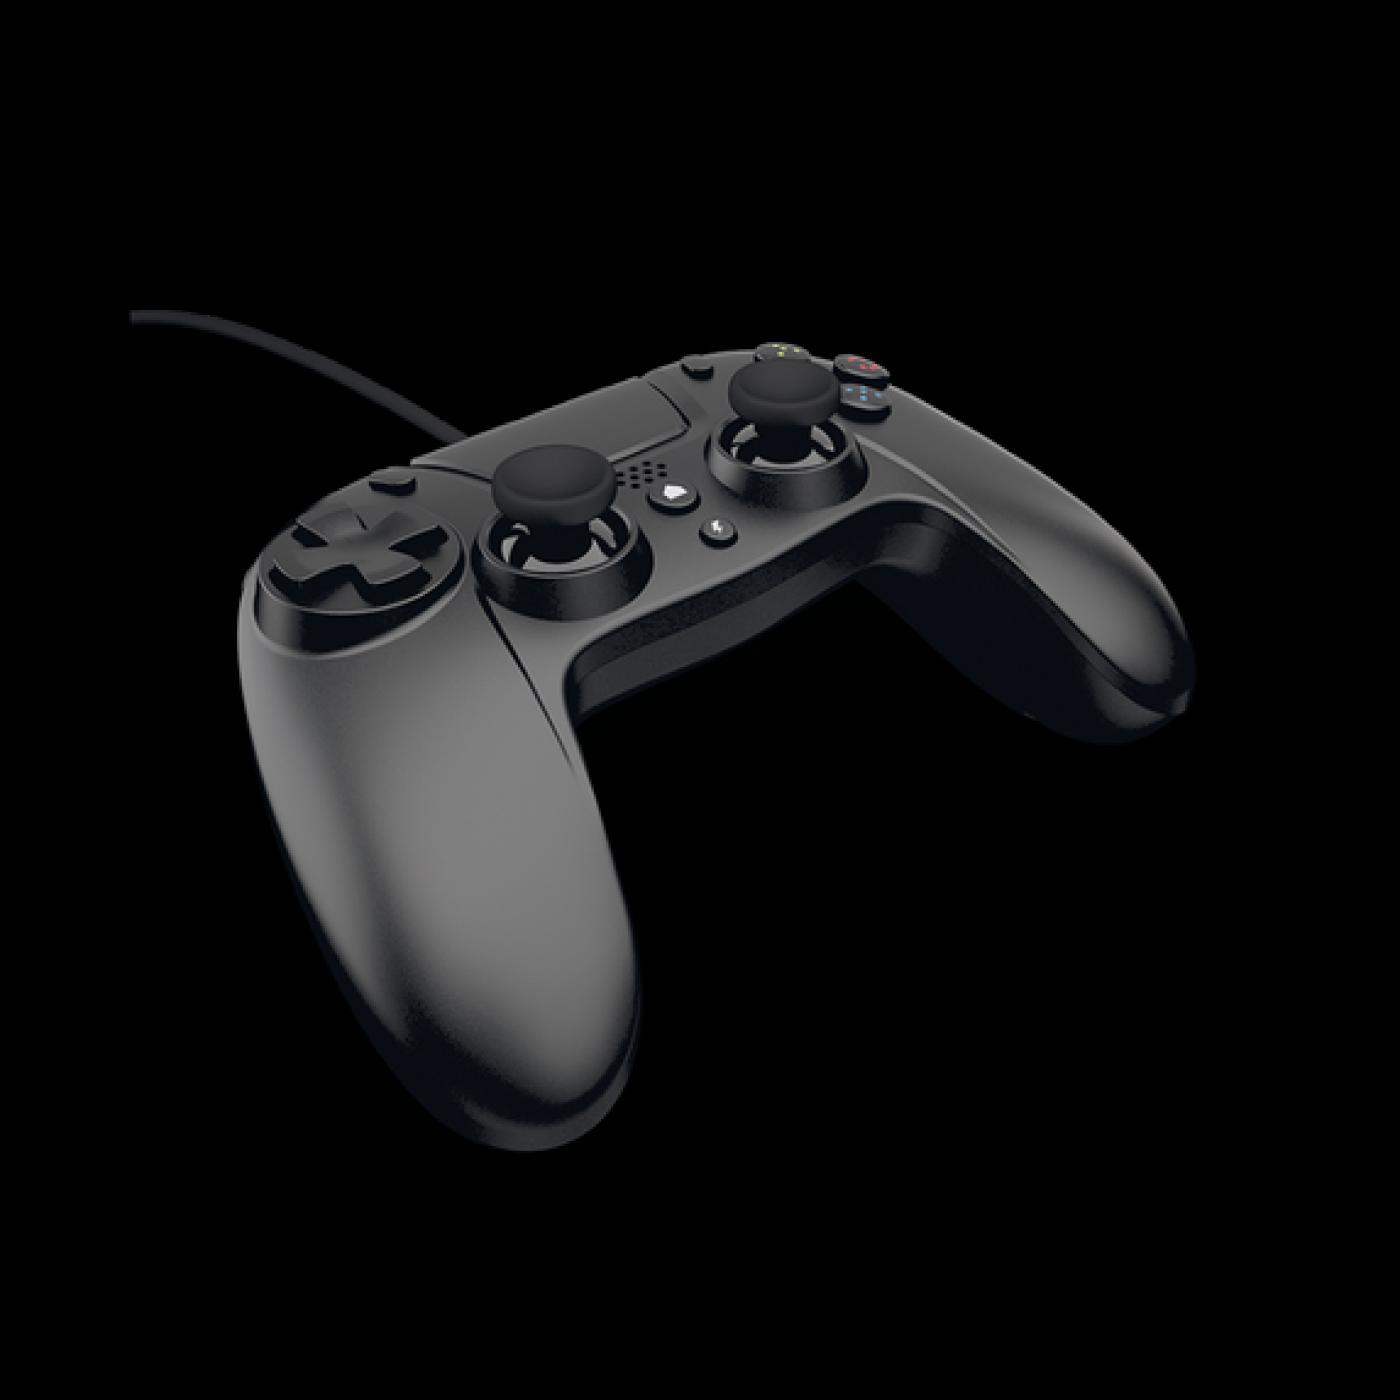 Gioteck Playstation 4 VX-4 Wireless BT Controller